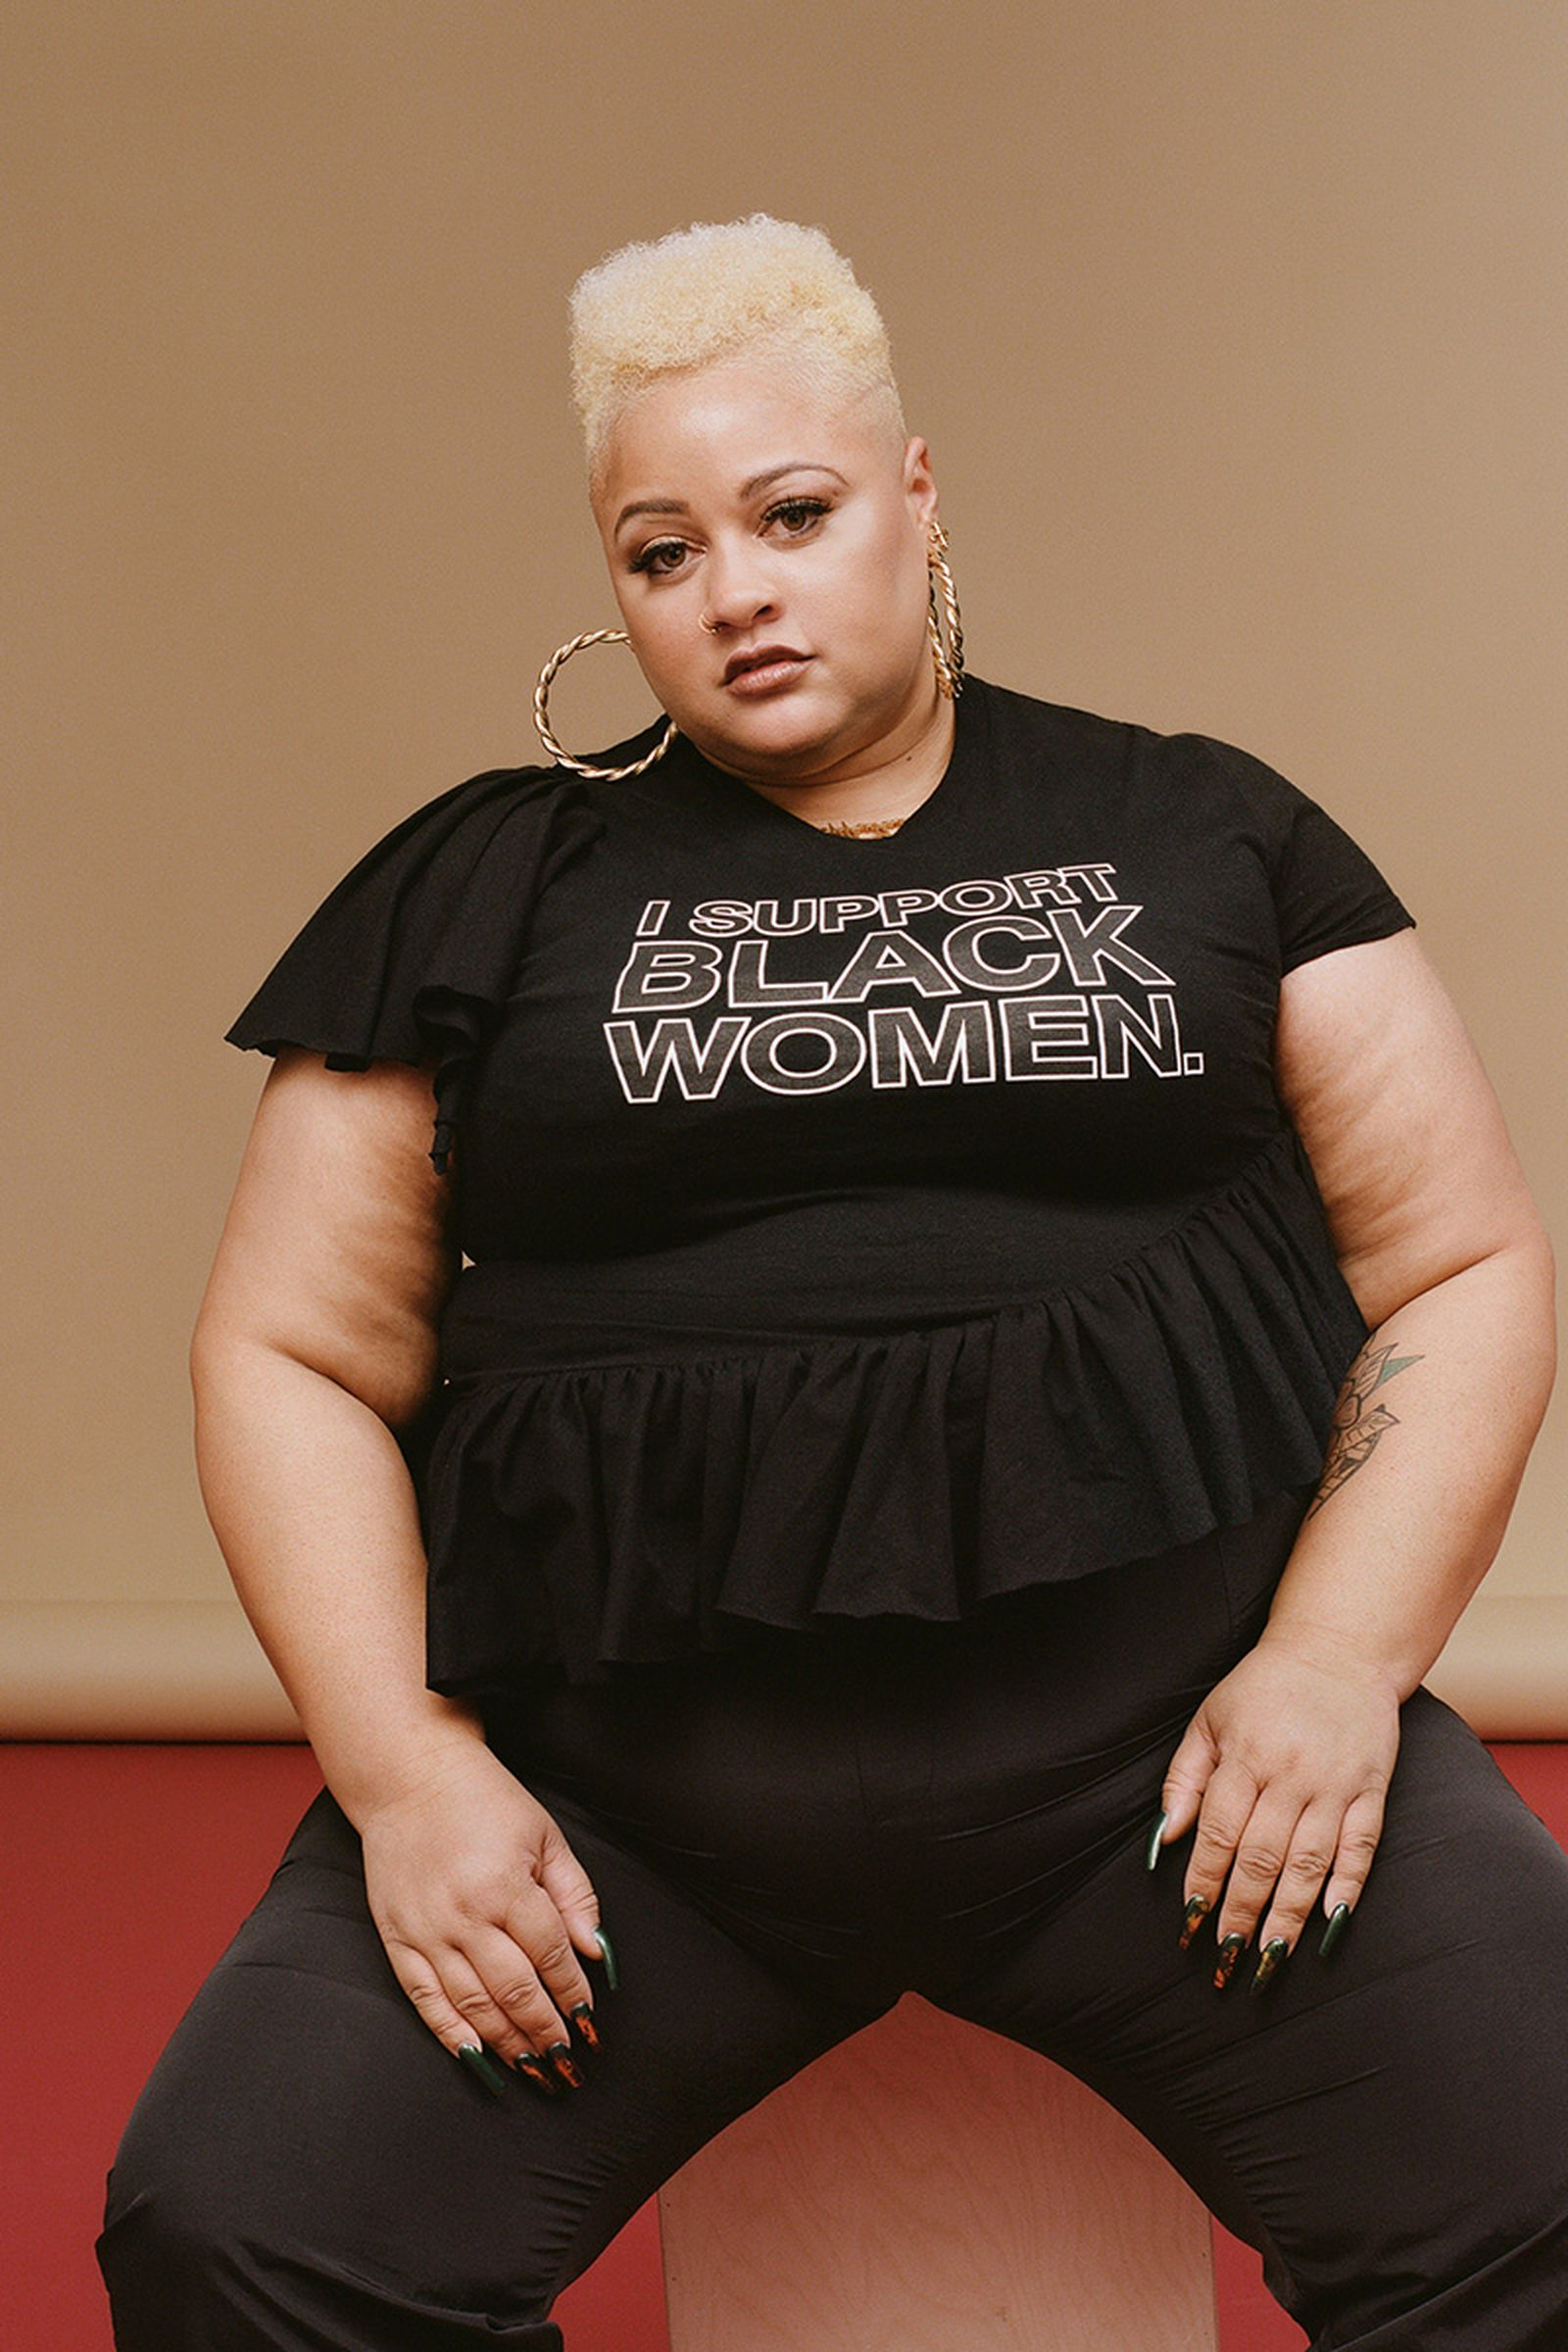 off-white-i-support-black-women-09